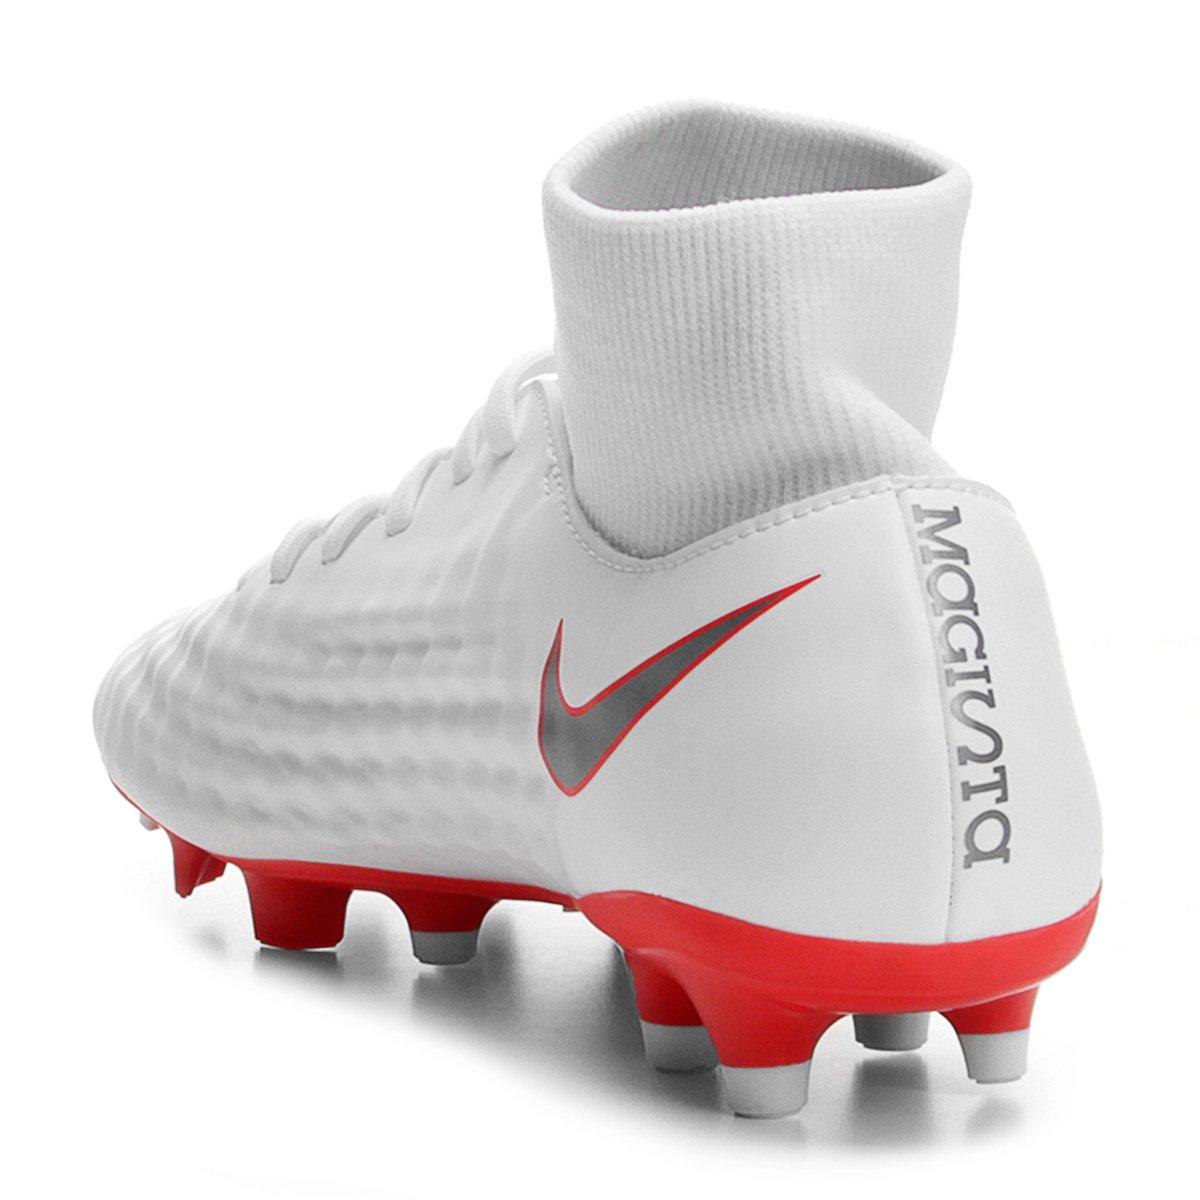 Chuteira Campo Nike Magista Obra 2 Academy DF FG - Branco e Cinza ... d894aa07aab14